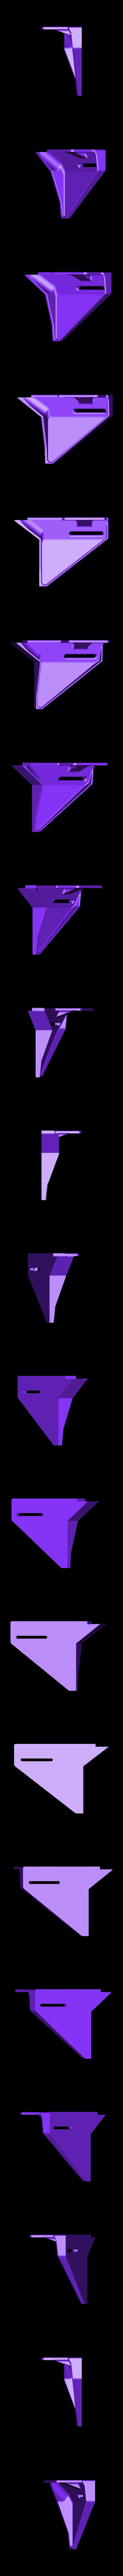 bat mount2 (1pcs).STL Download STL file Folding Quadcopter 450 Frame • 3D print object, AleksandrDolzhenko